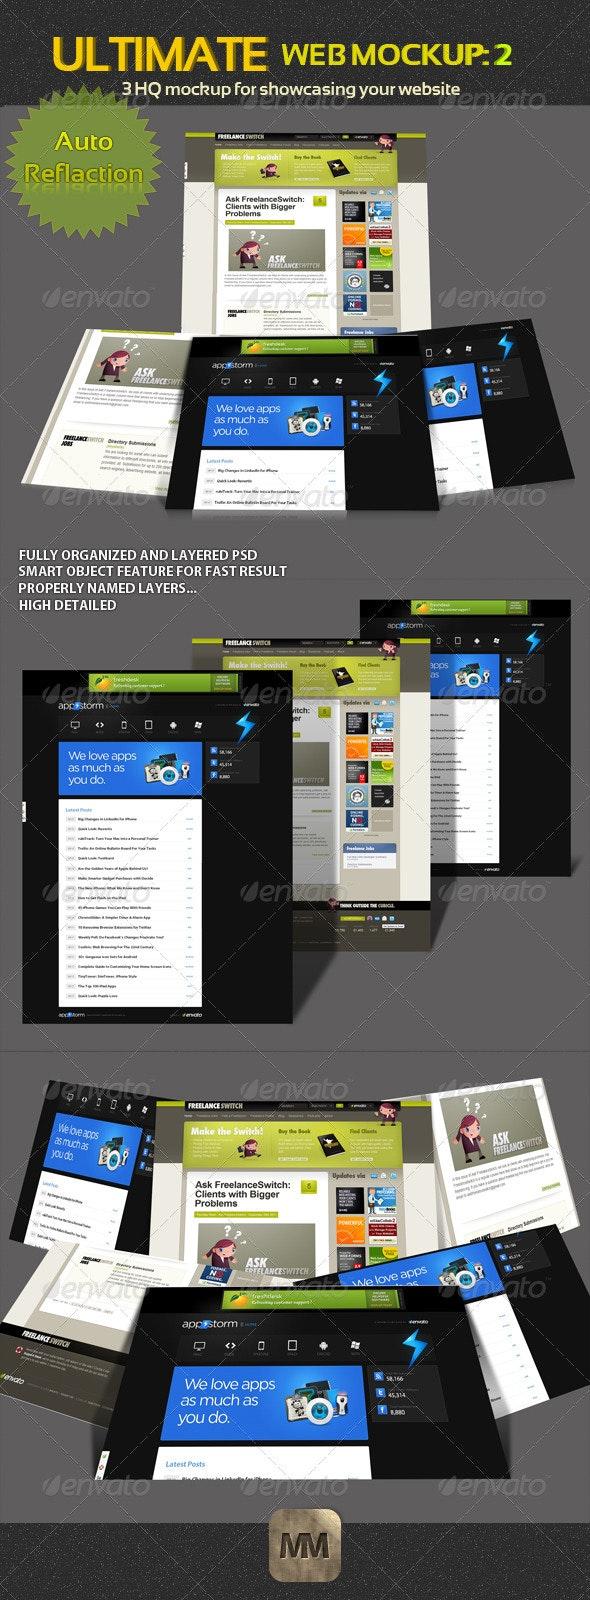 Web Mockup Pack - 2 - Website Displays